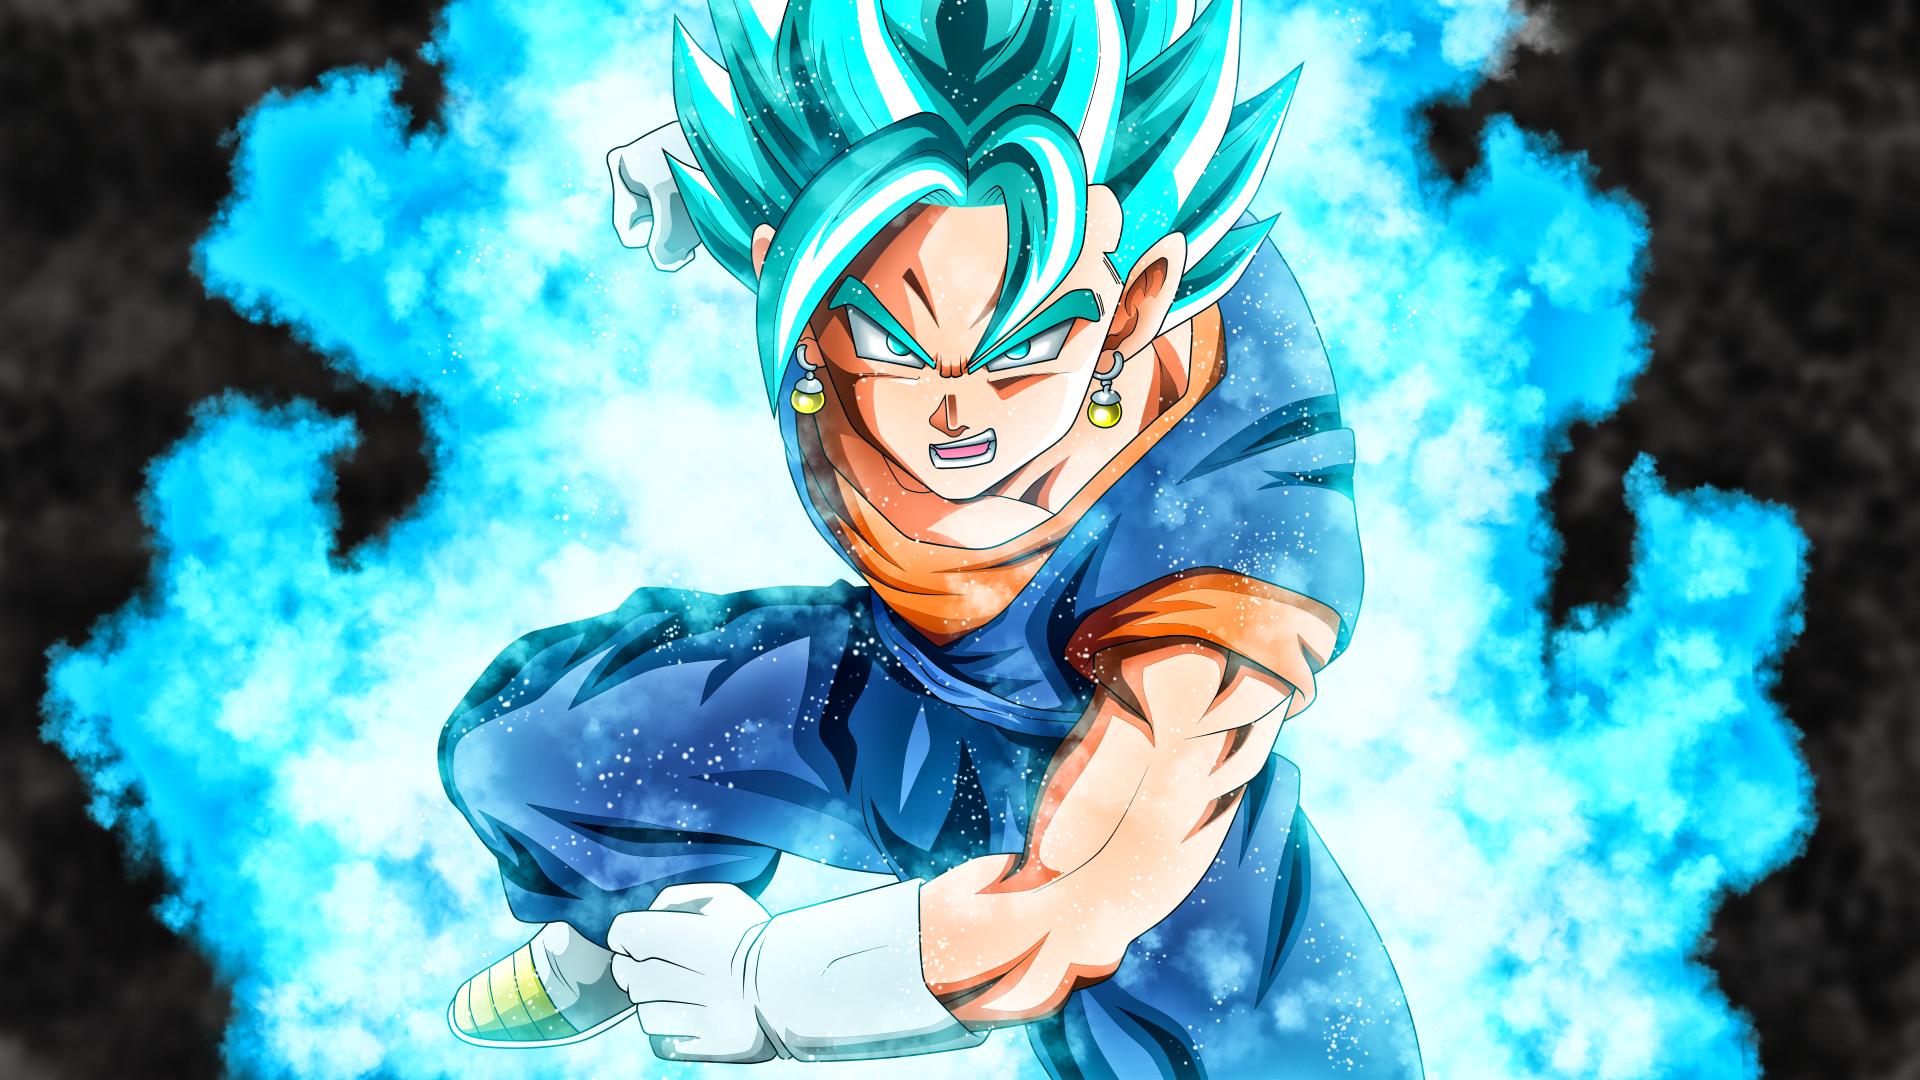 Anime - Dragon Ball Super  Vegito (Dragon Ball) Wallpaper